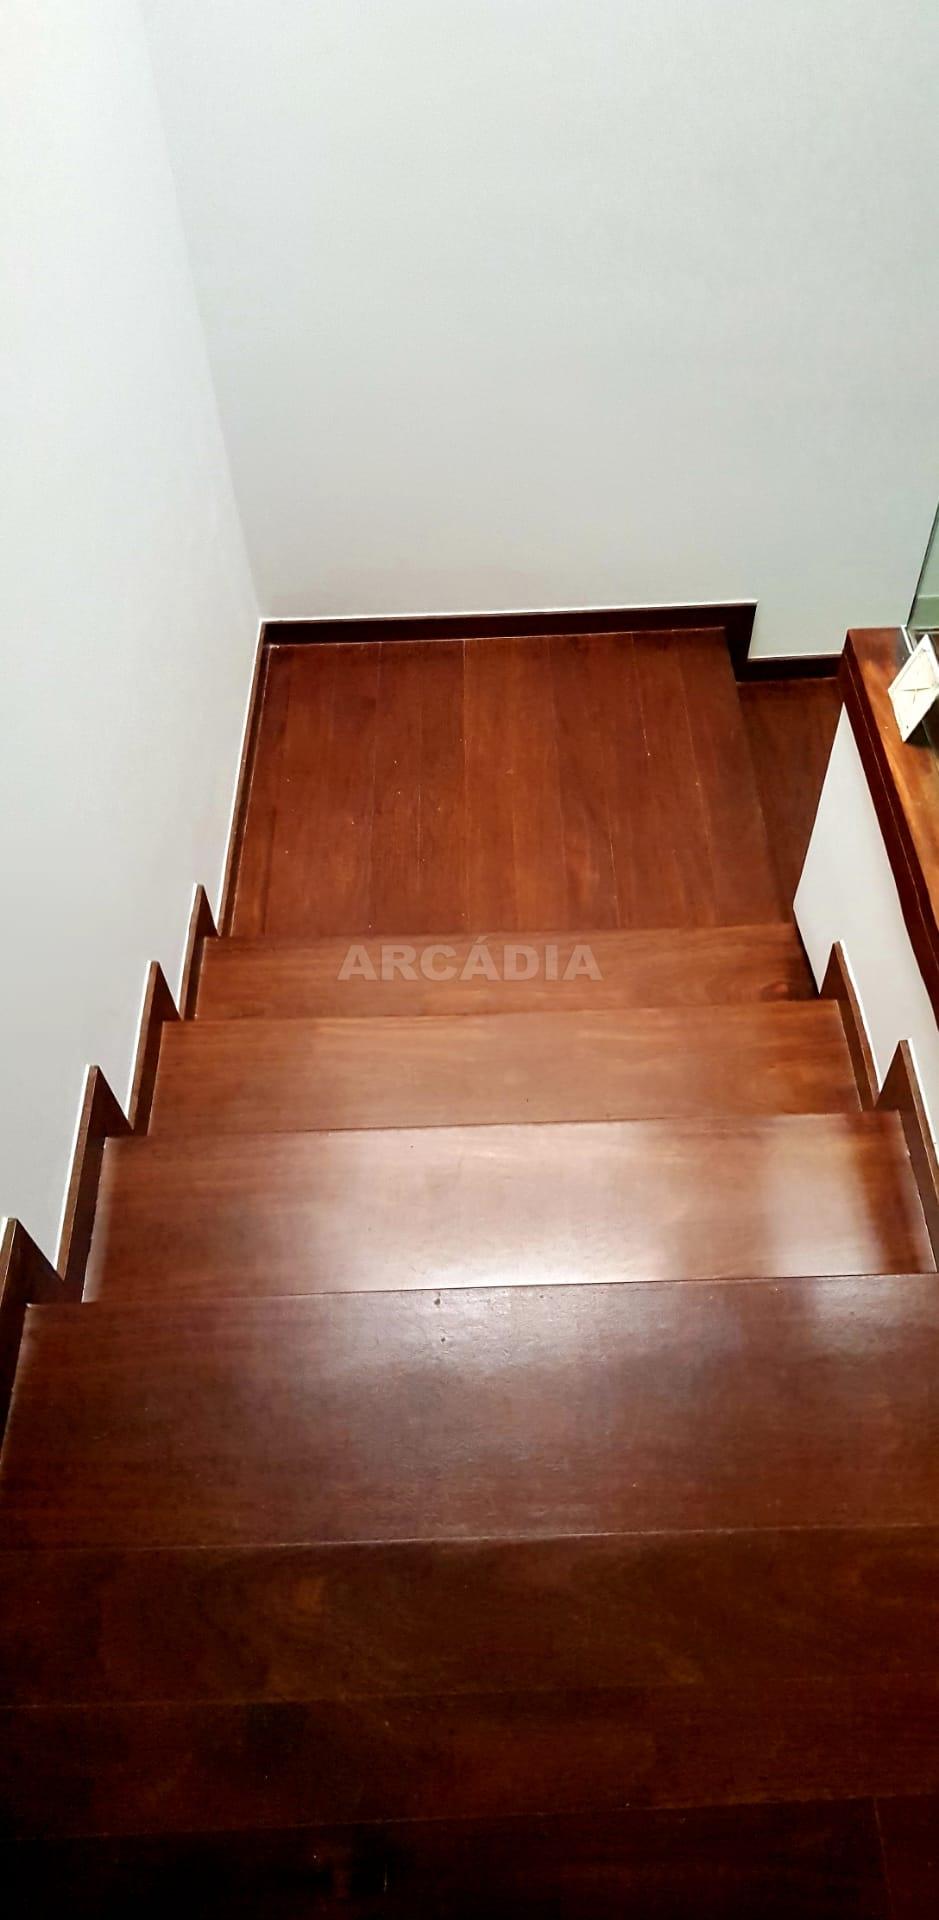 arcadia-imobiliaria-moradia-3665-519